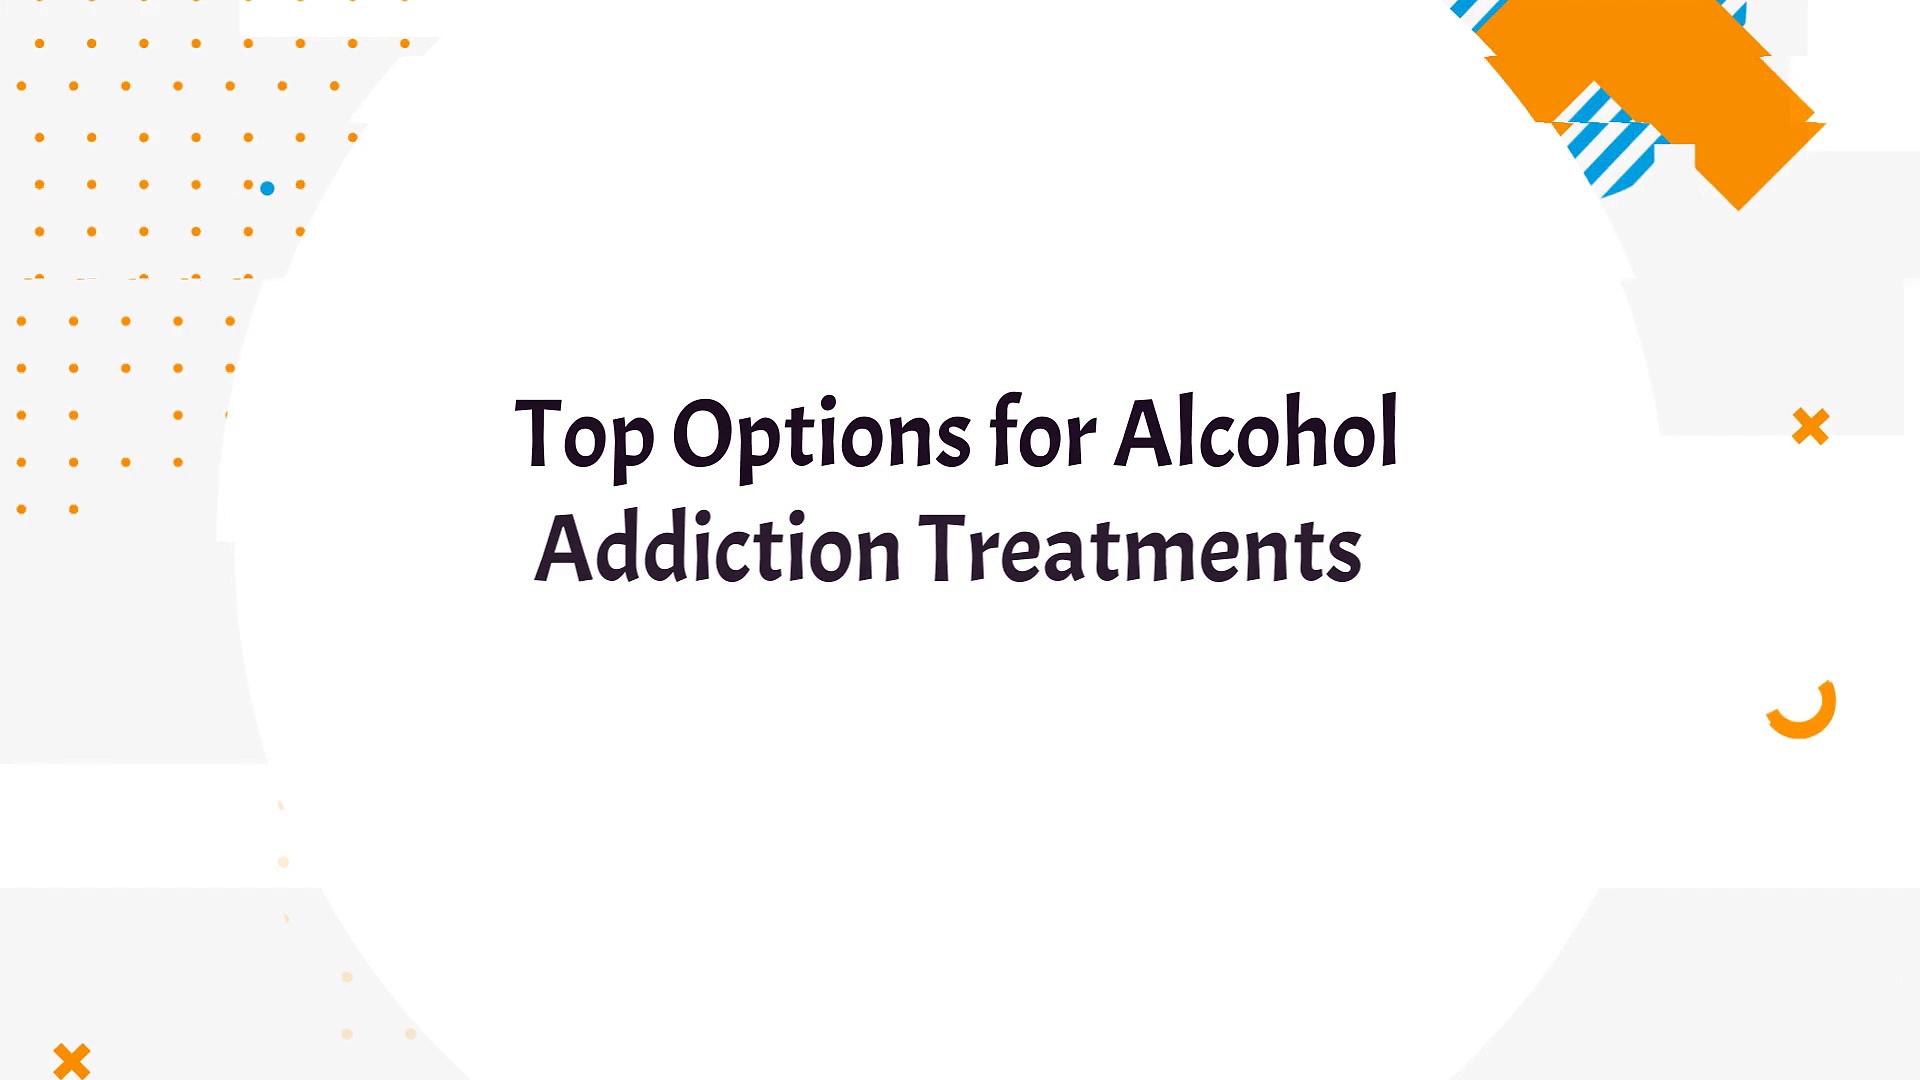 Top Options for Alcohol Addiction Treatments | Addiction Rehab Centres